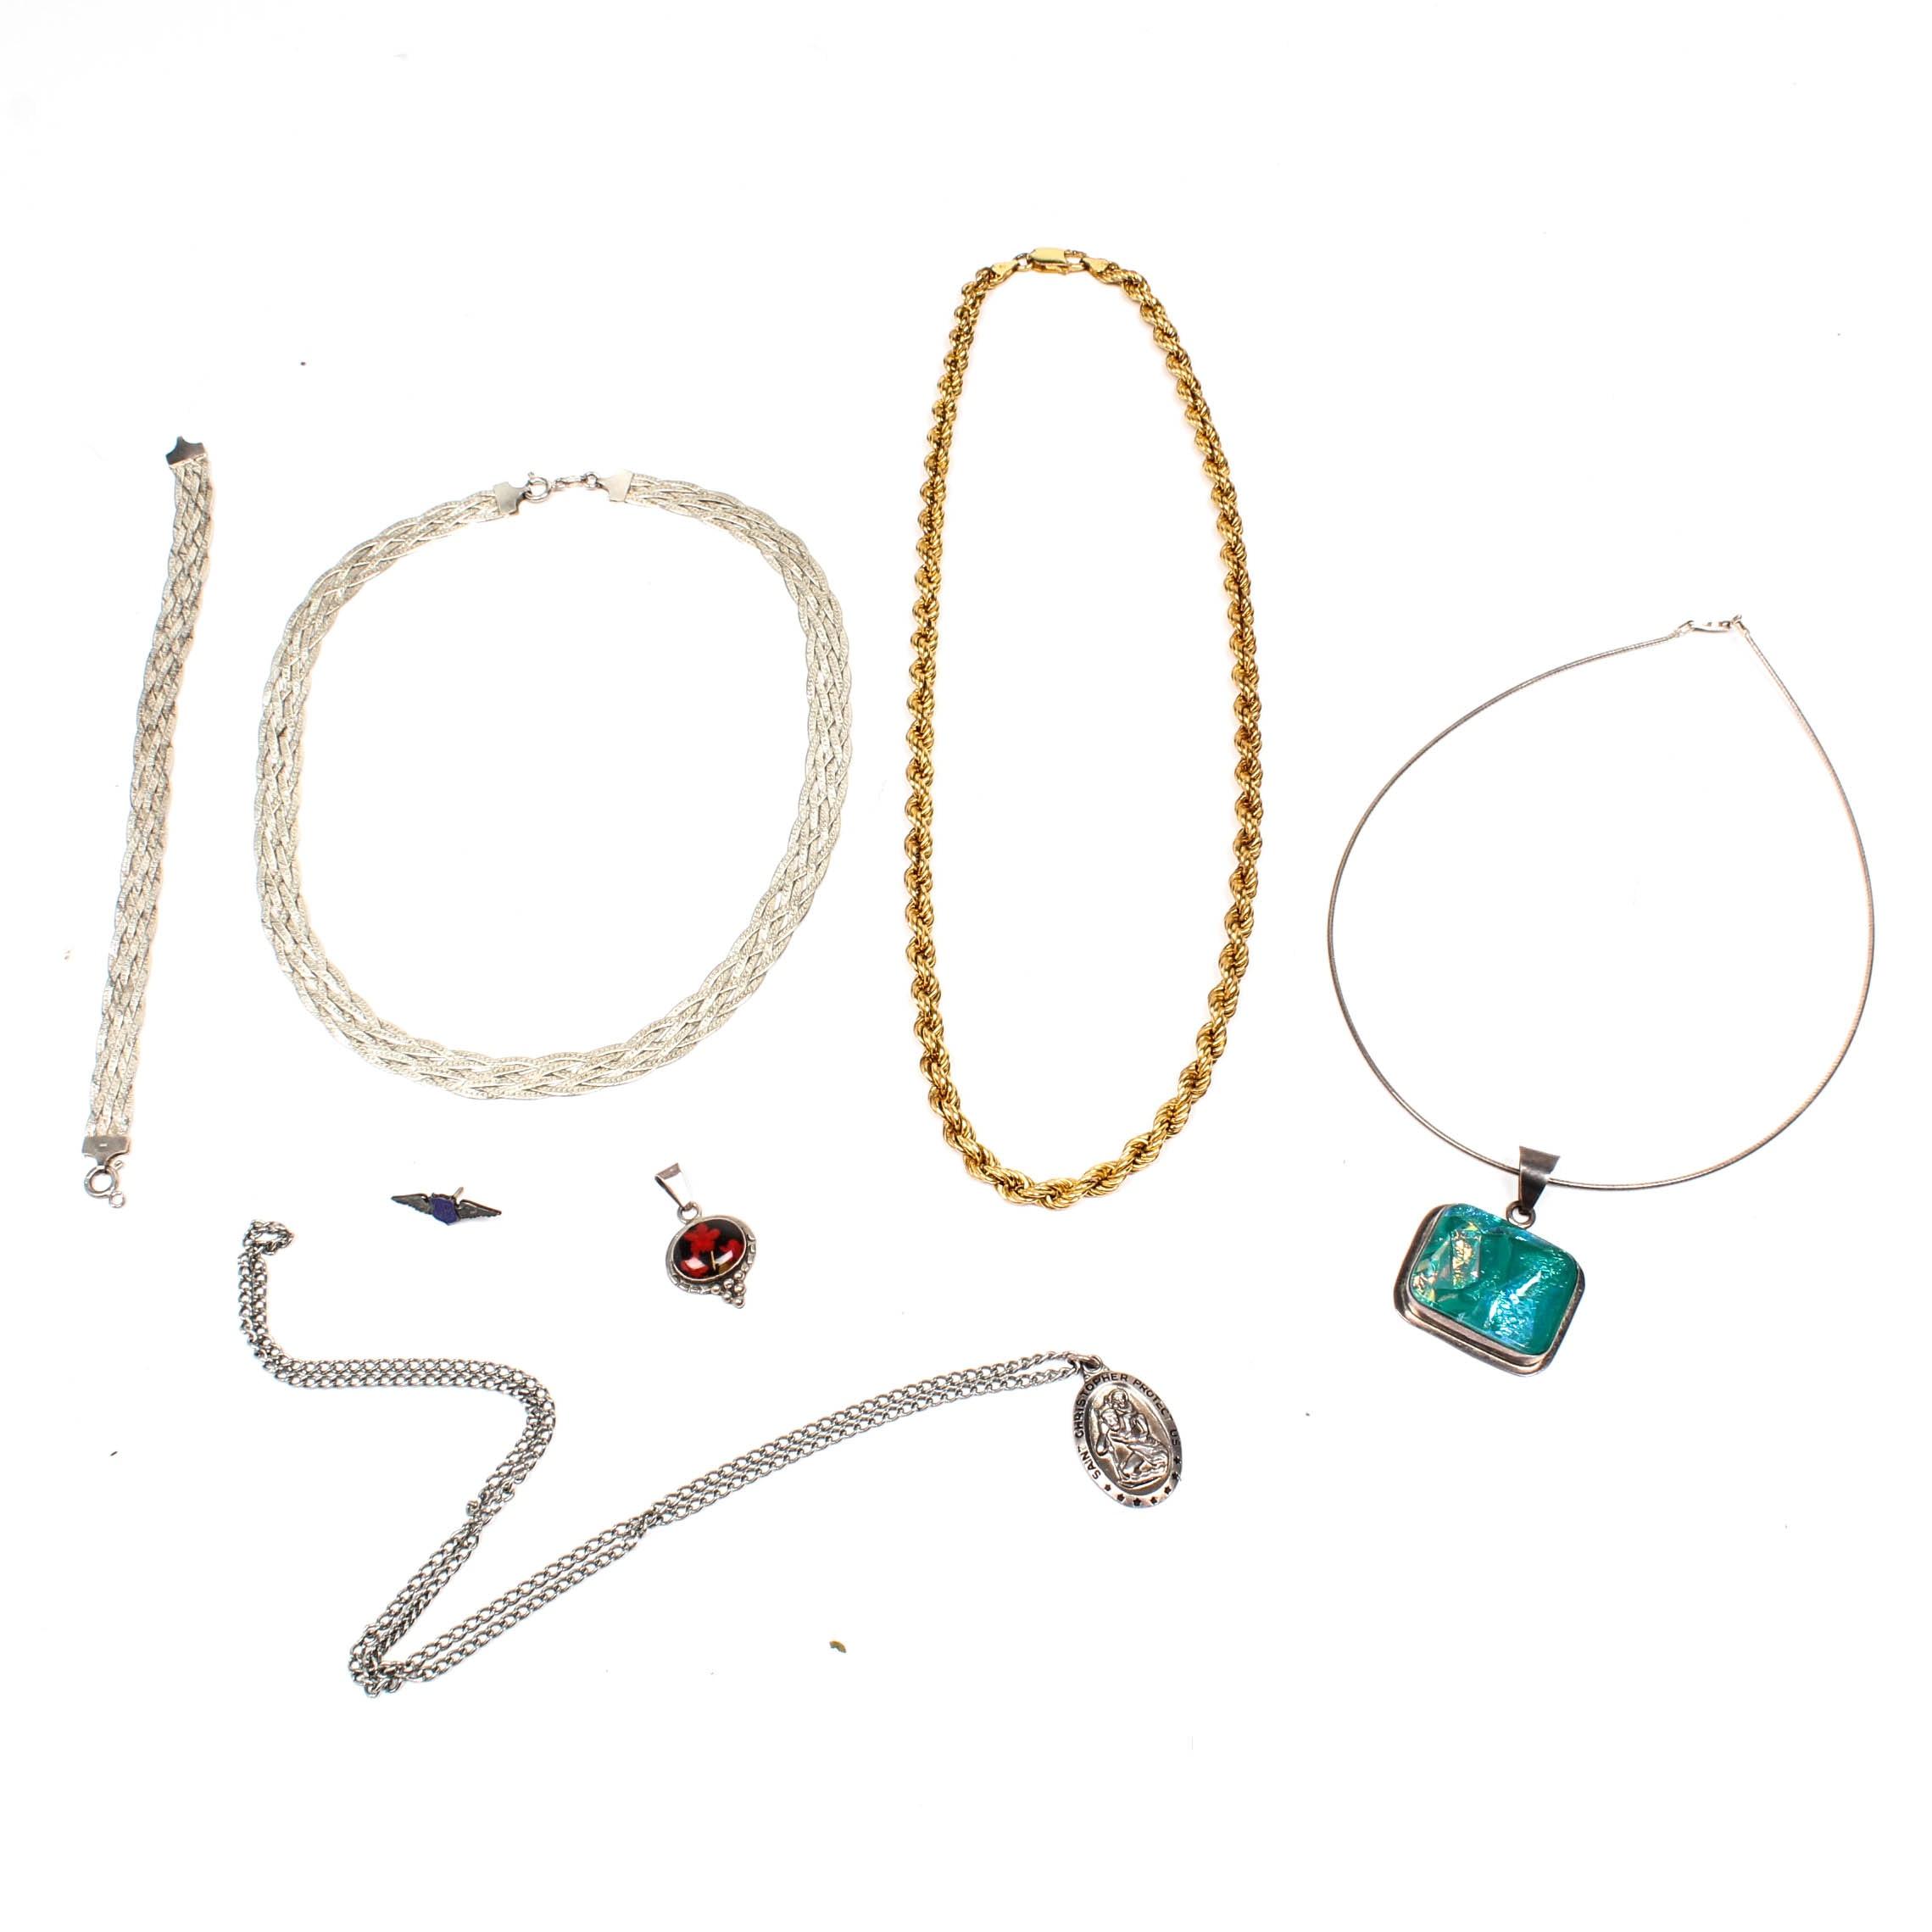 Sterling Silver Necklaces, Bracelet and Pendants